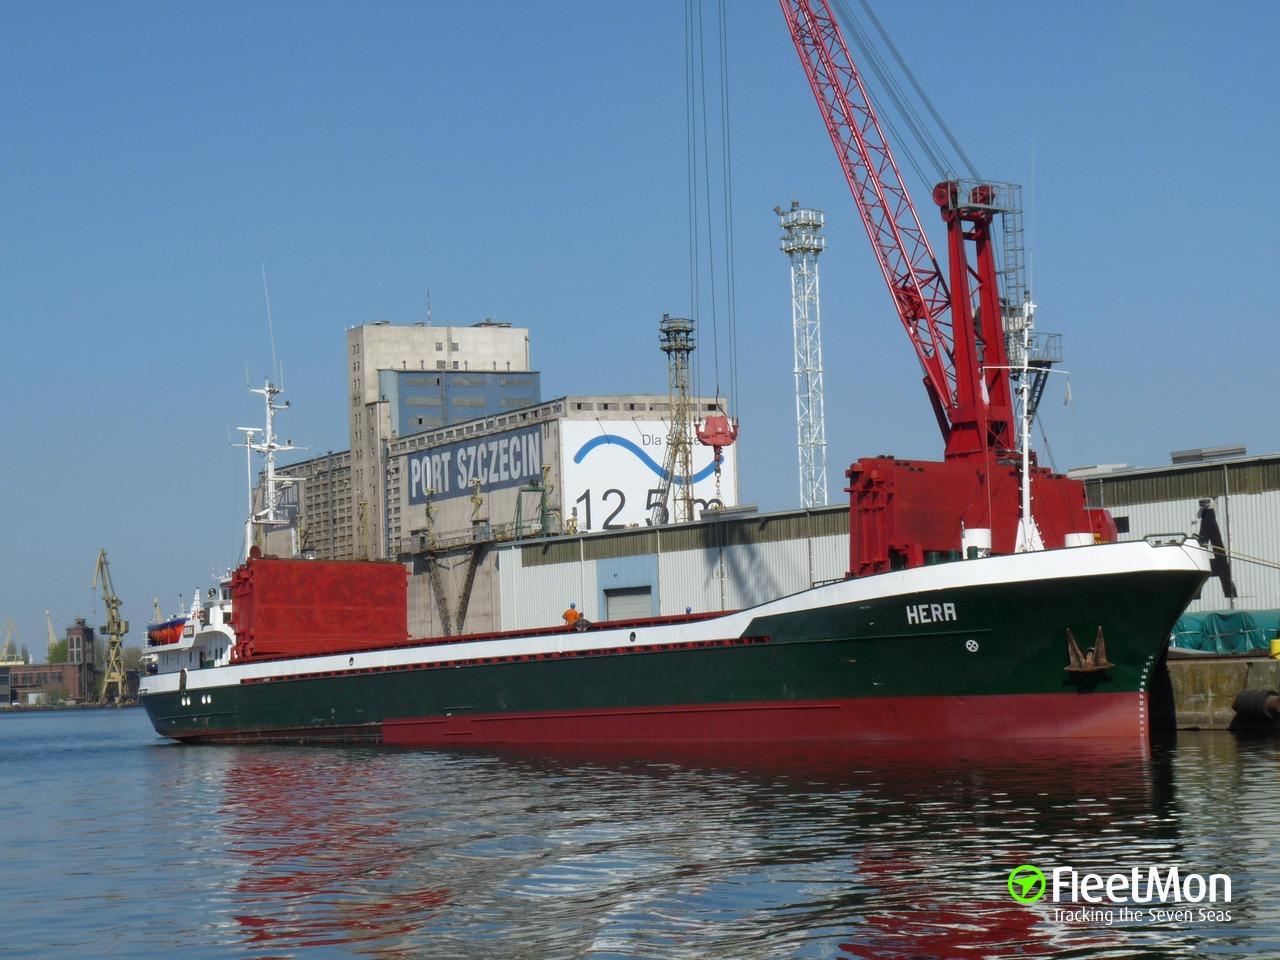 Vessel HERA (Cargo ship) IMO 7434078, MMSI 325466000